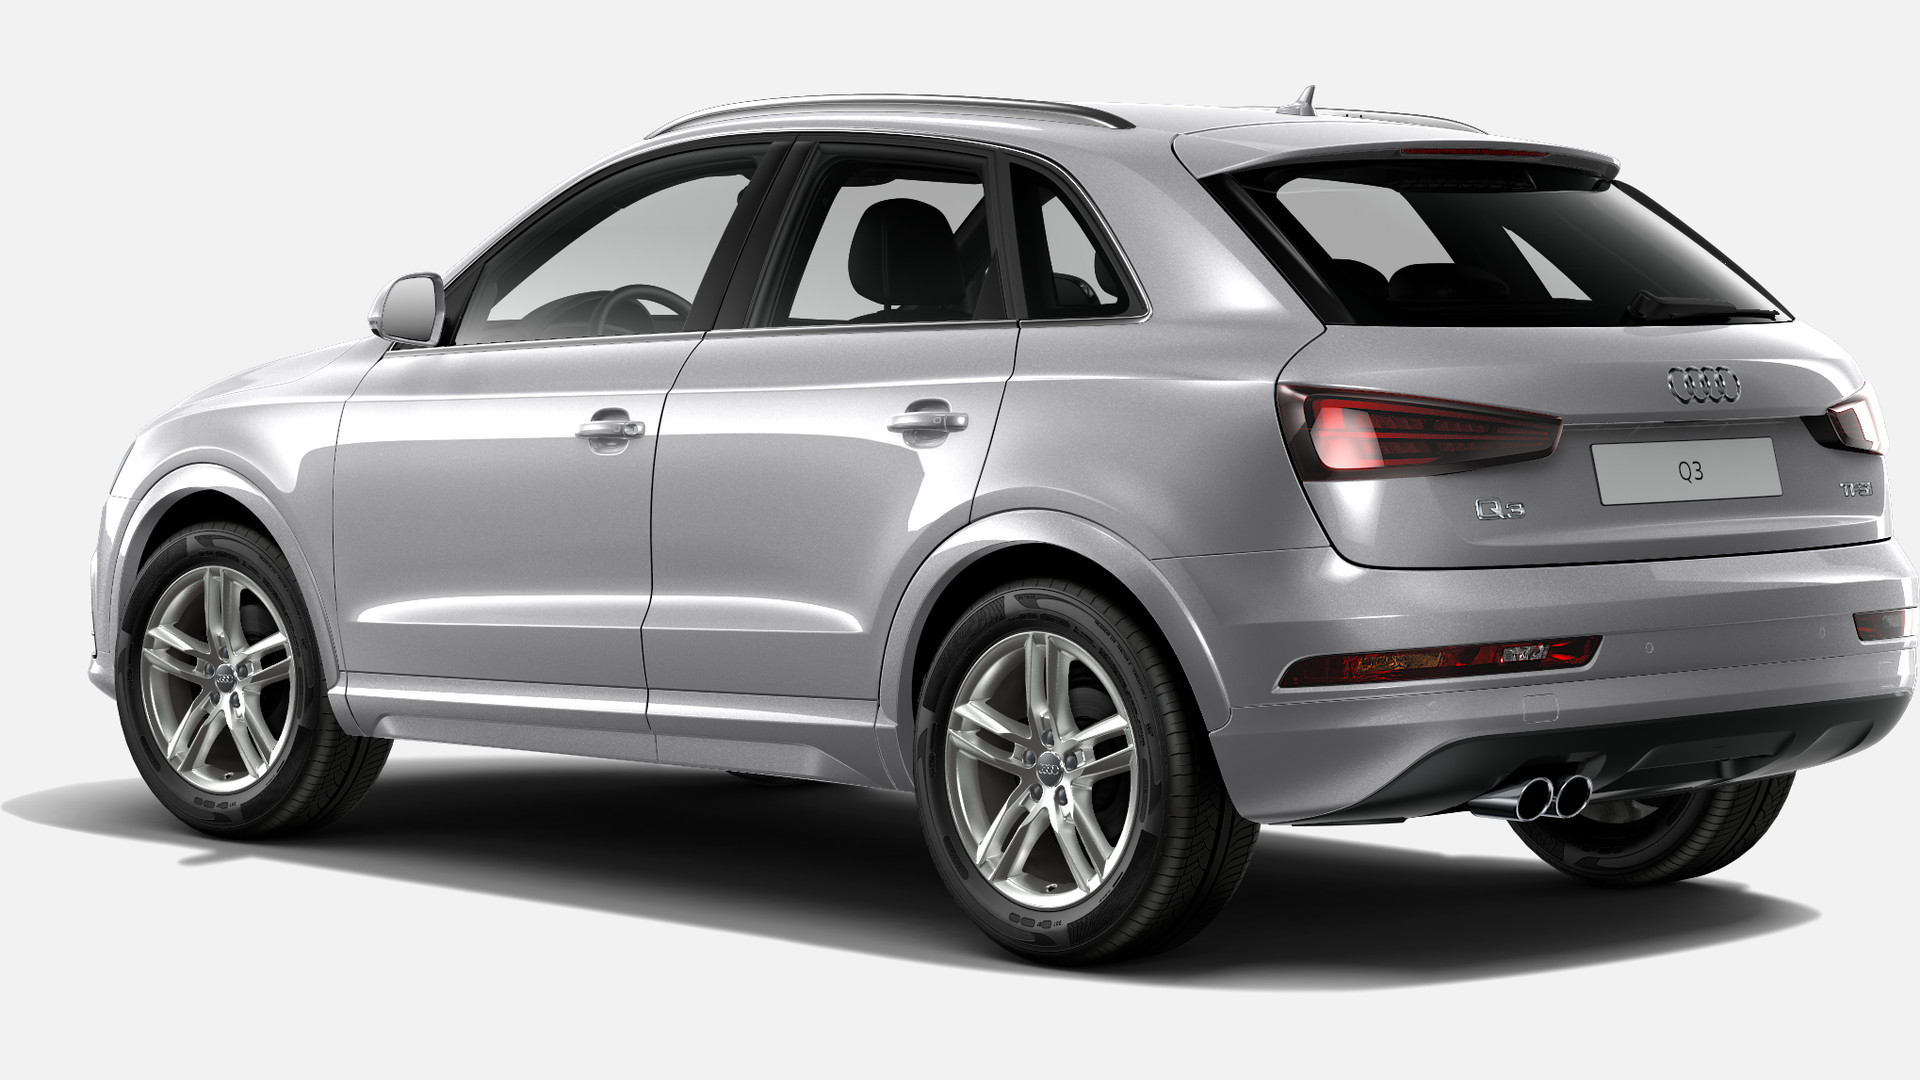 Audi Q3 1.4 TFSI CoD Sport Edition 110 kW (150 CV)